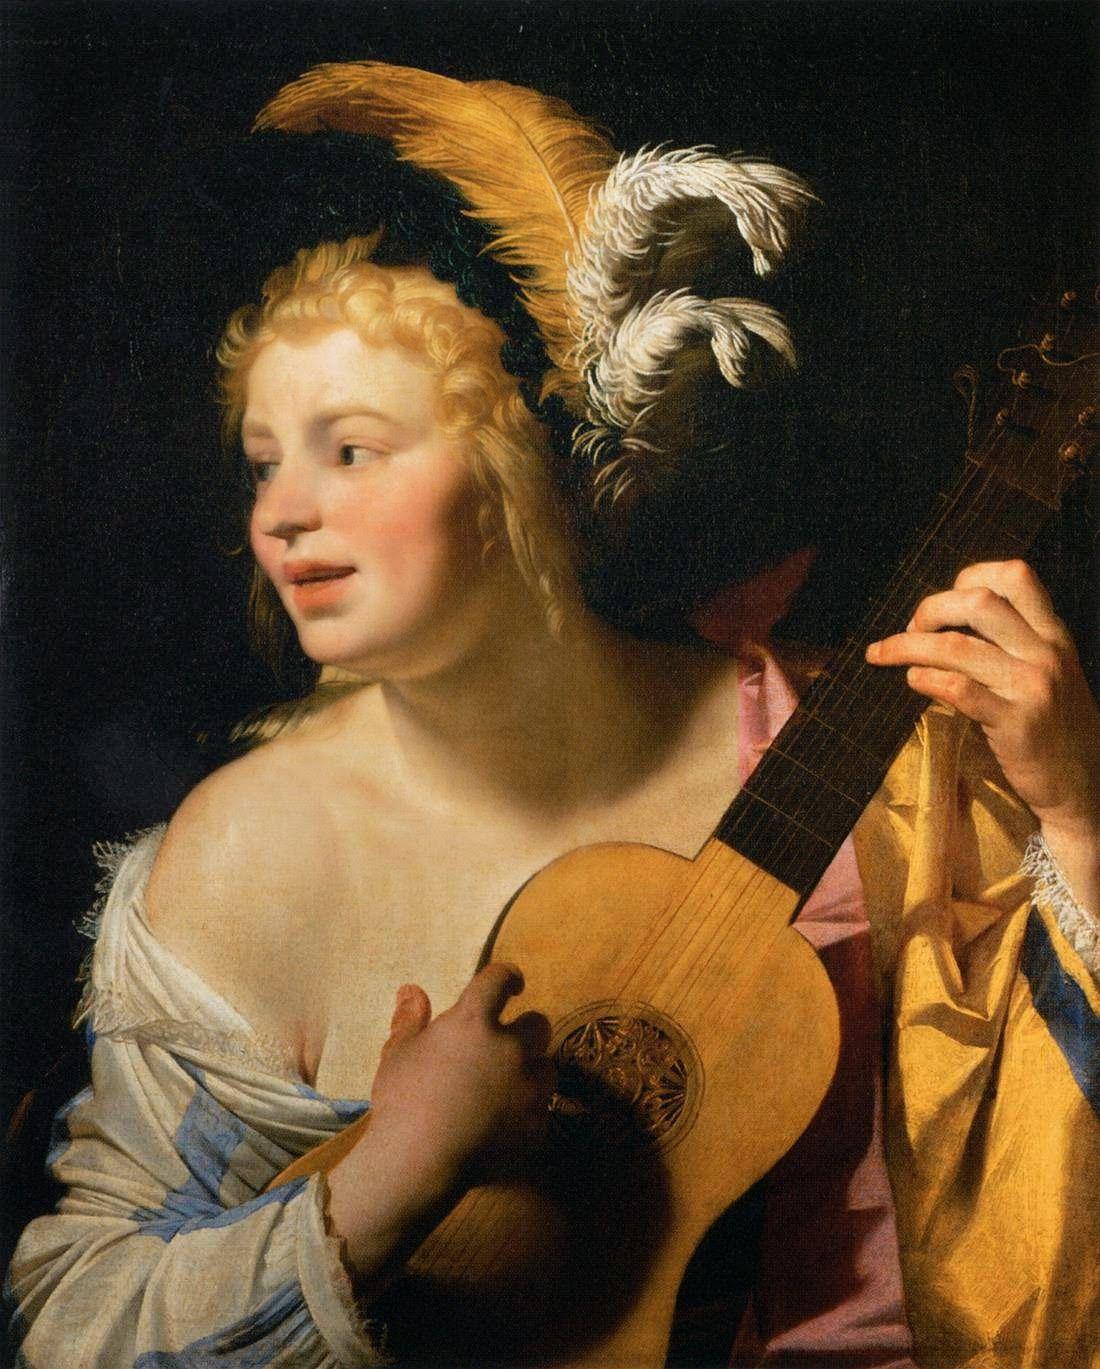 Woman Playing the Guitar - Gerrit van Honthorst (1624)